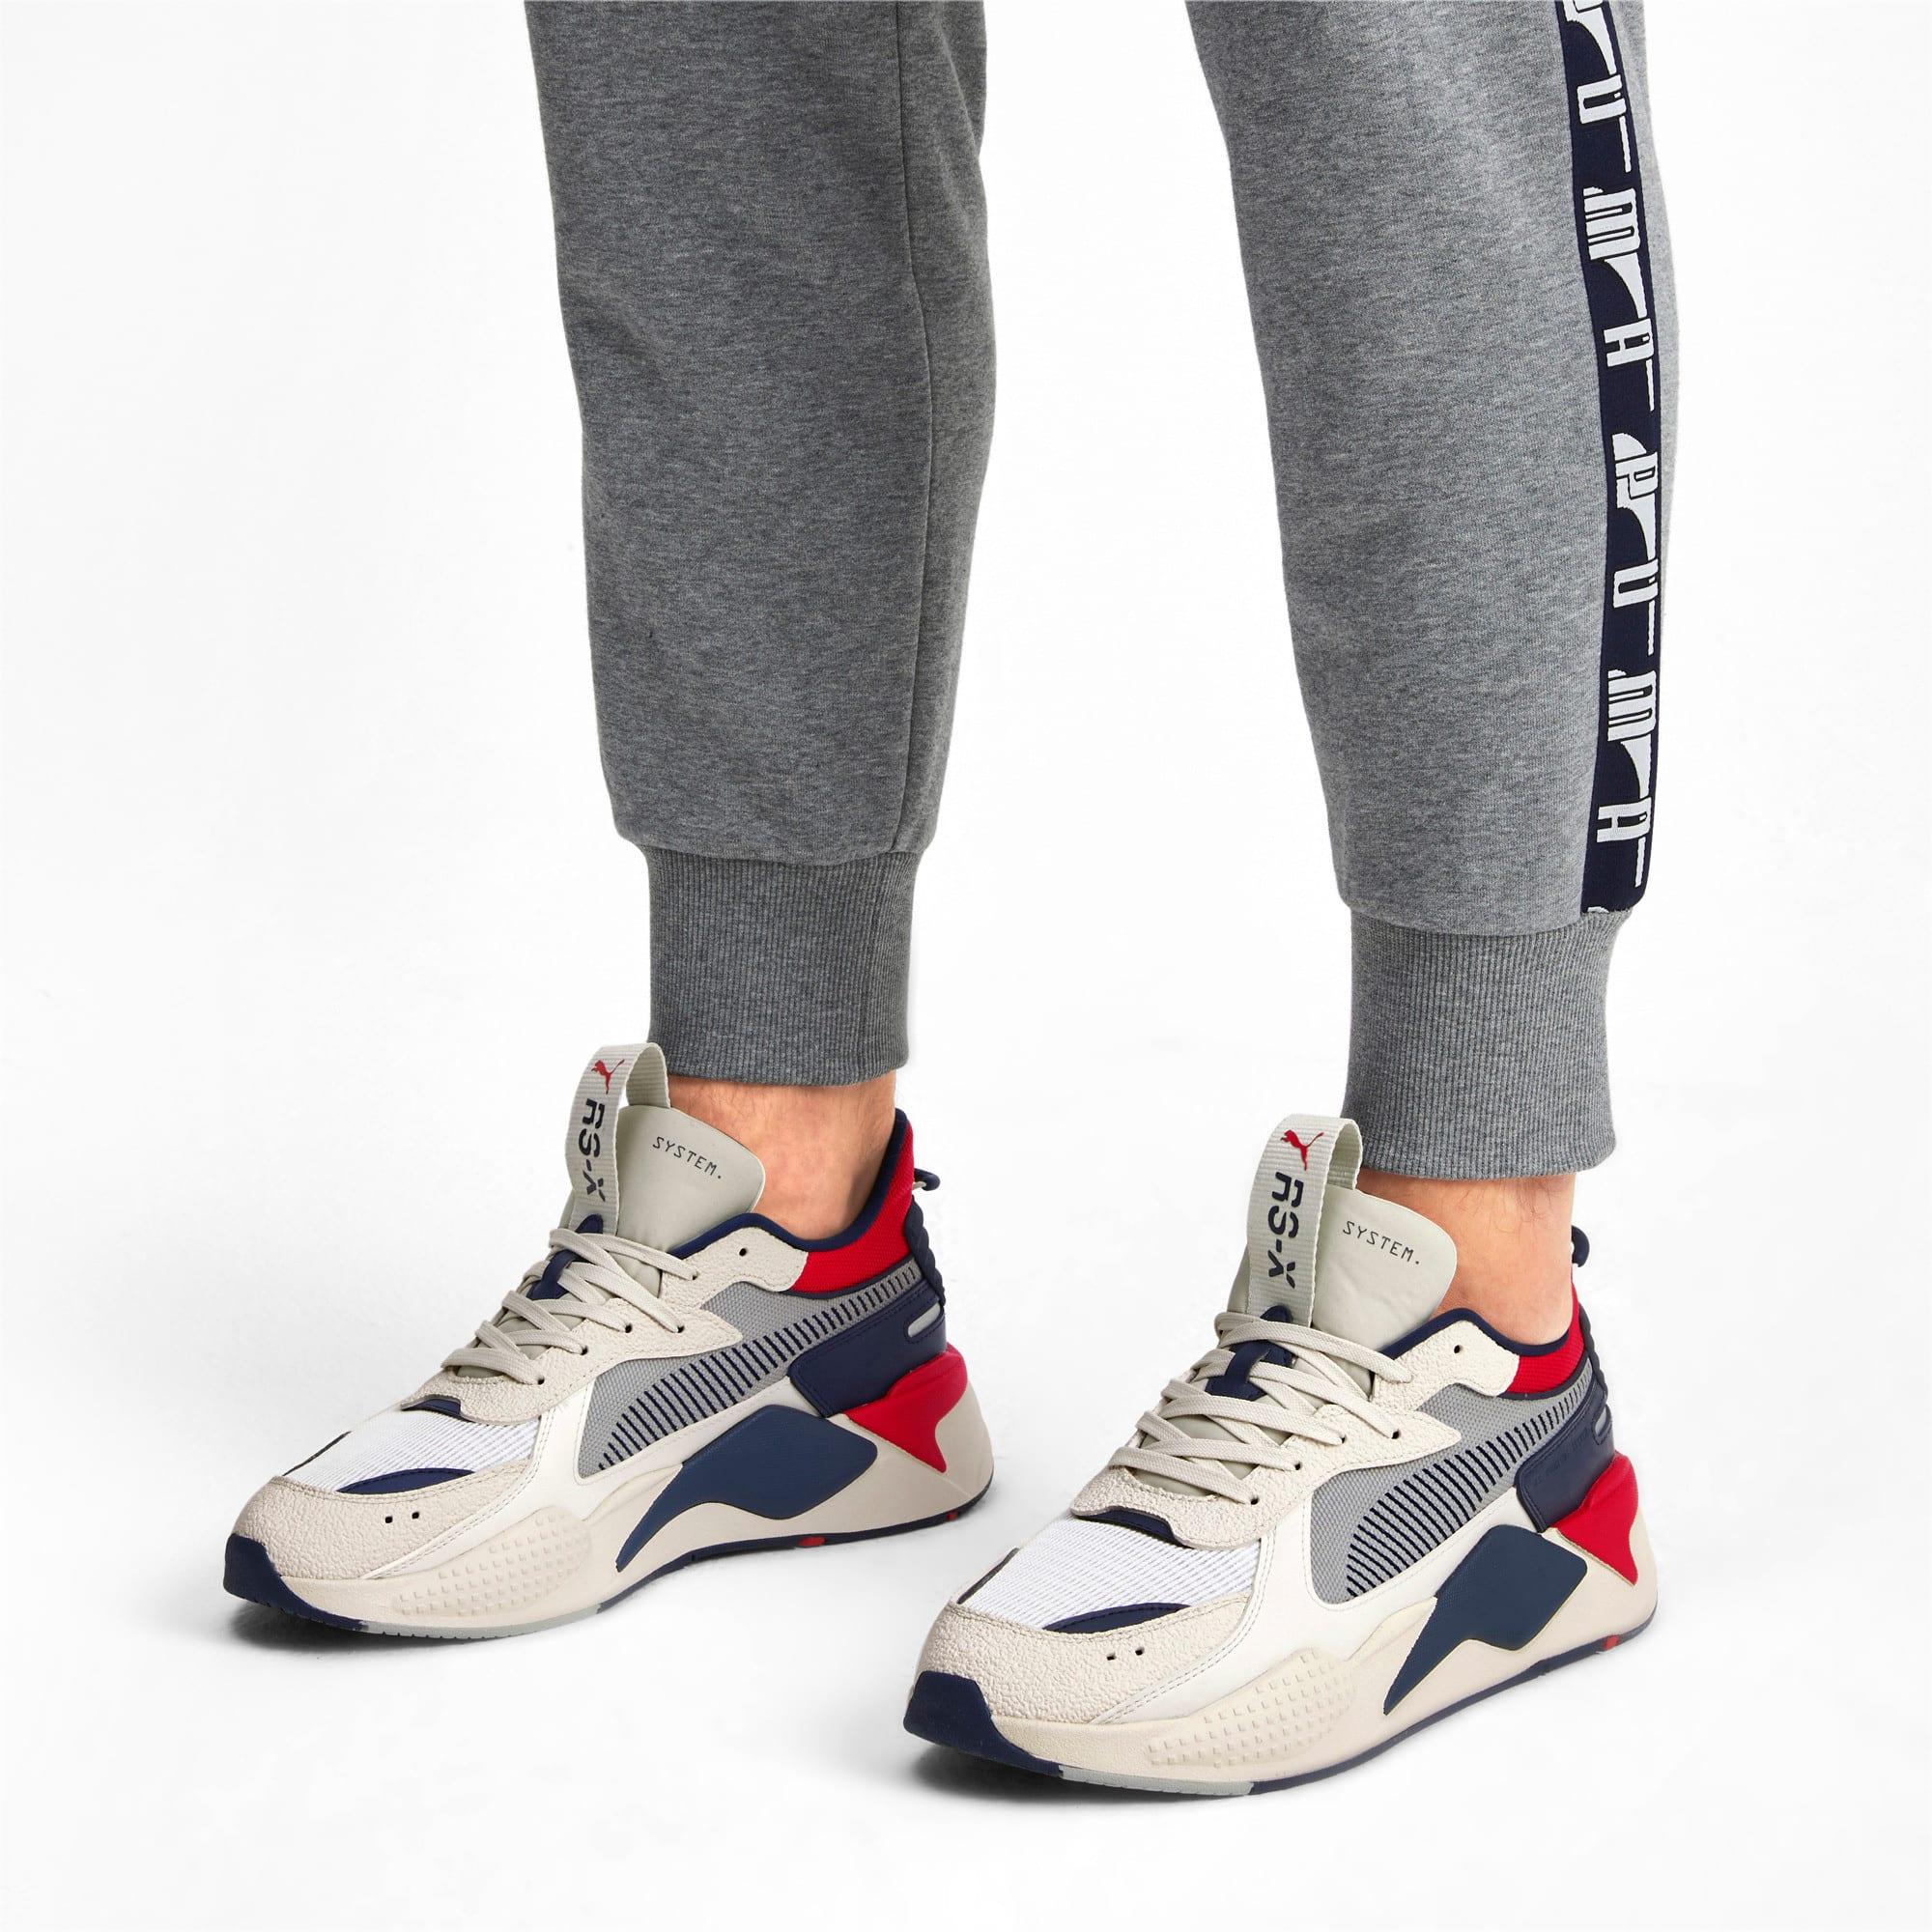 Thumbnail 2 of RS-X Hard Drive Sneakers, Whisper White-Peacoat, medium